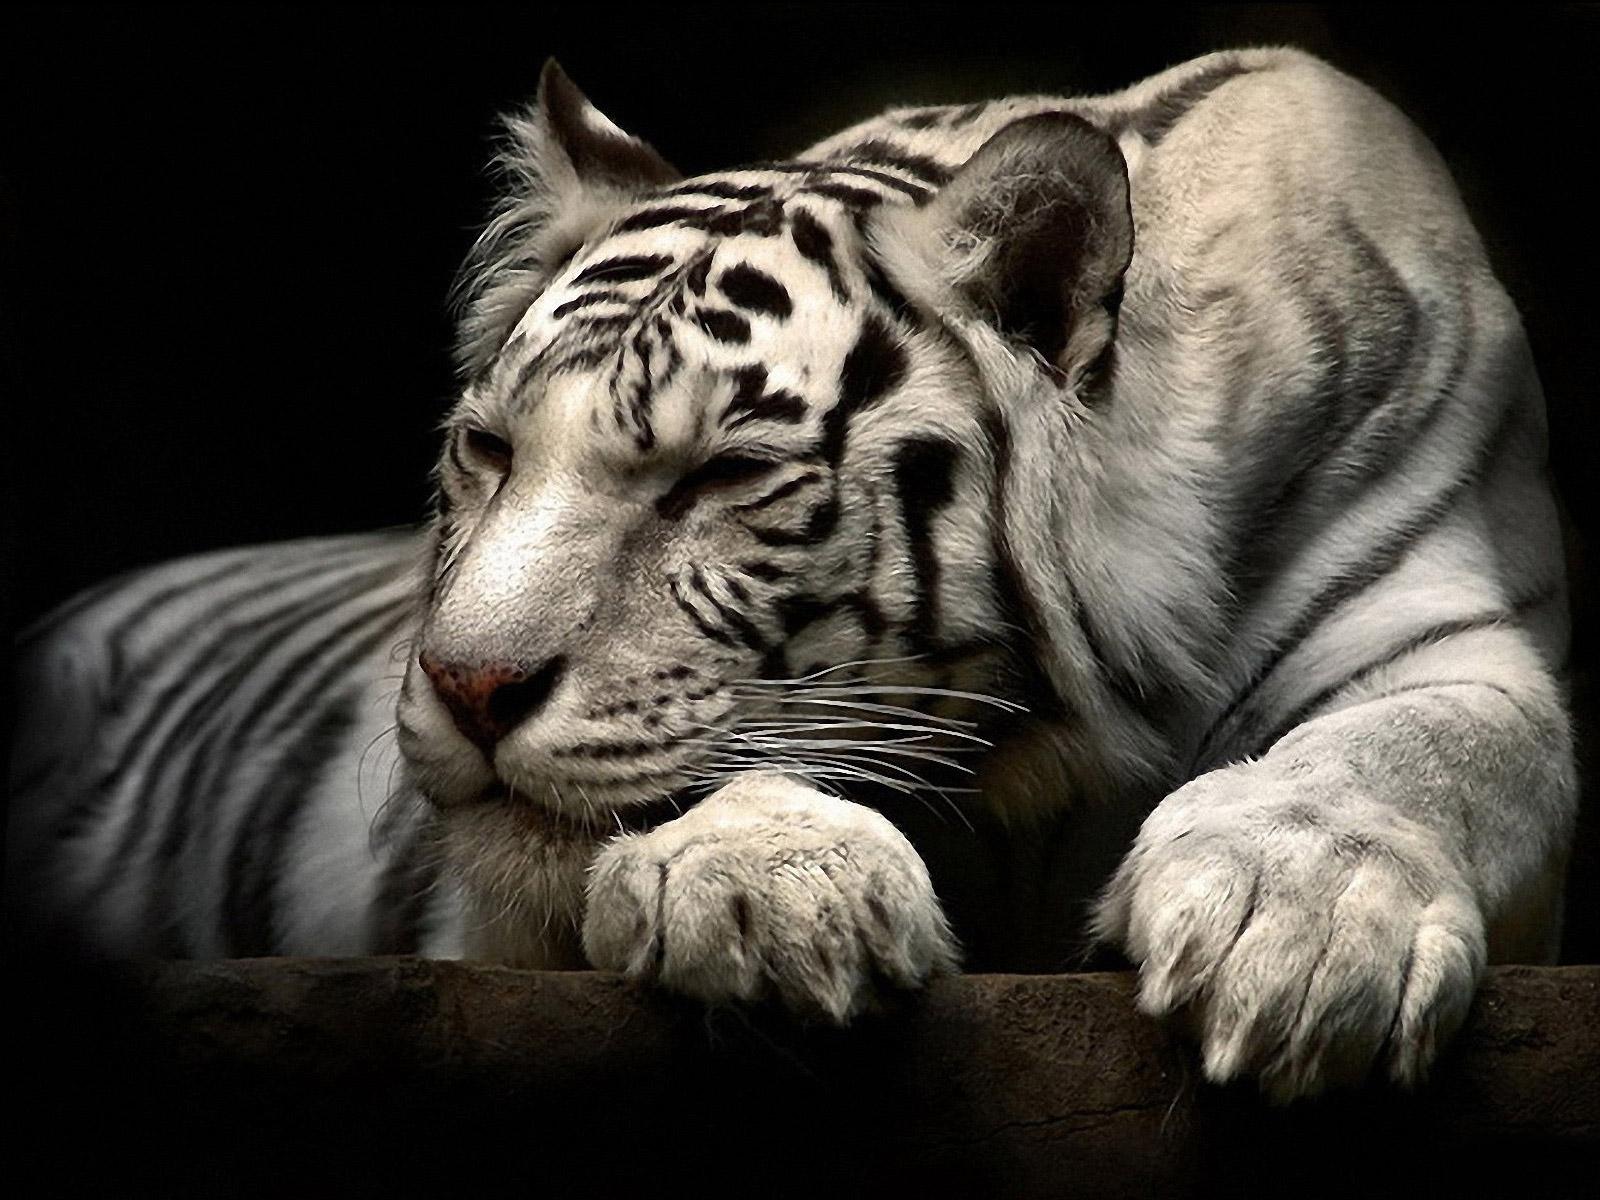 D-White-Tiger-wallpaper-wp400927-1